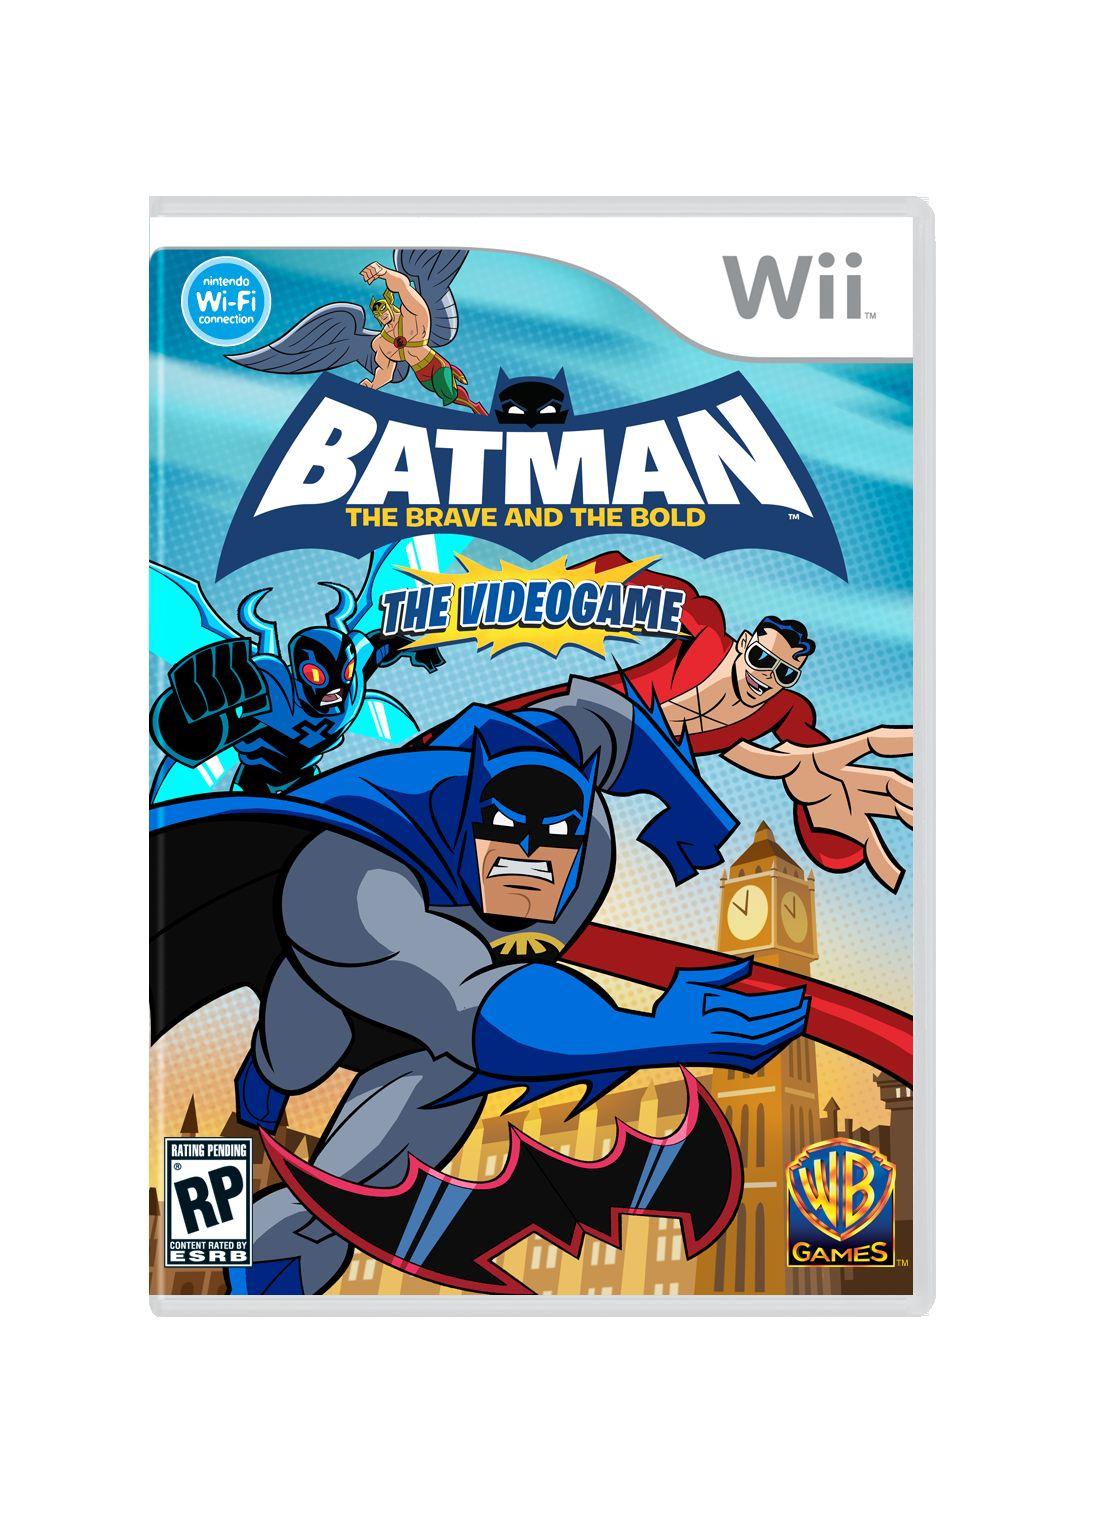 Wii u title keys how to use